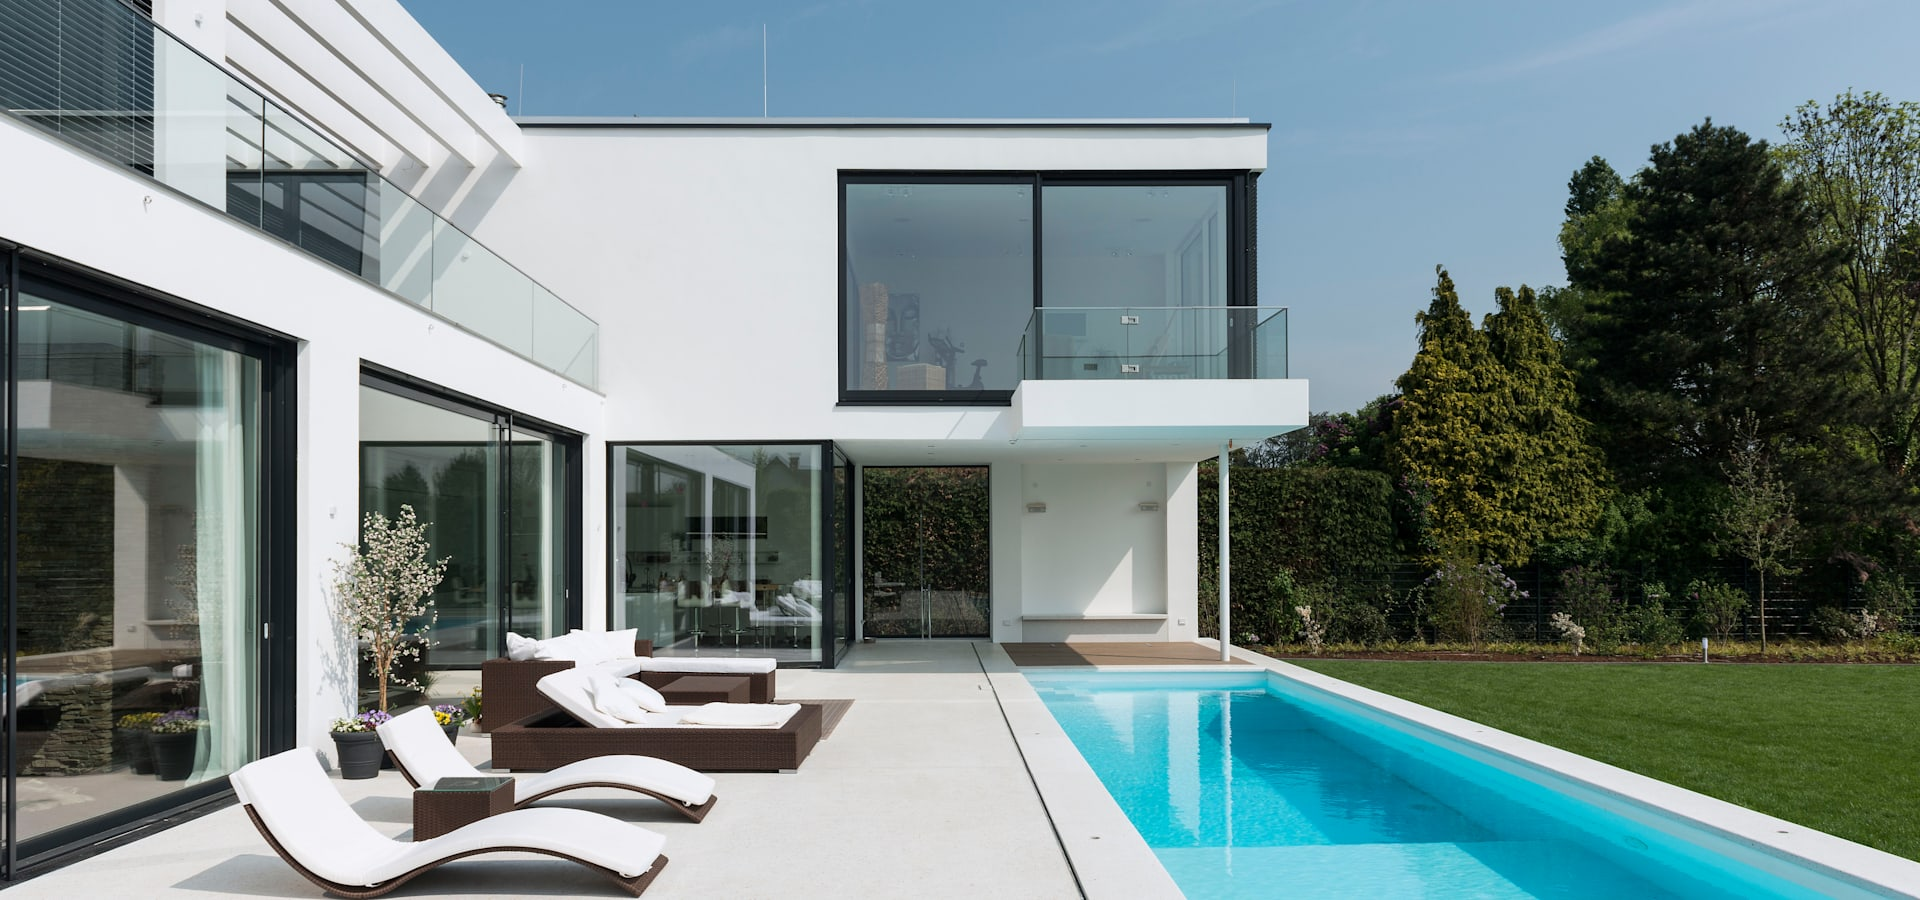 Villa Dusseldorf By SOHOarchitekten